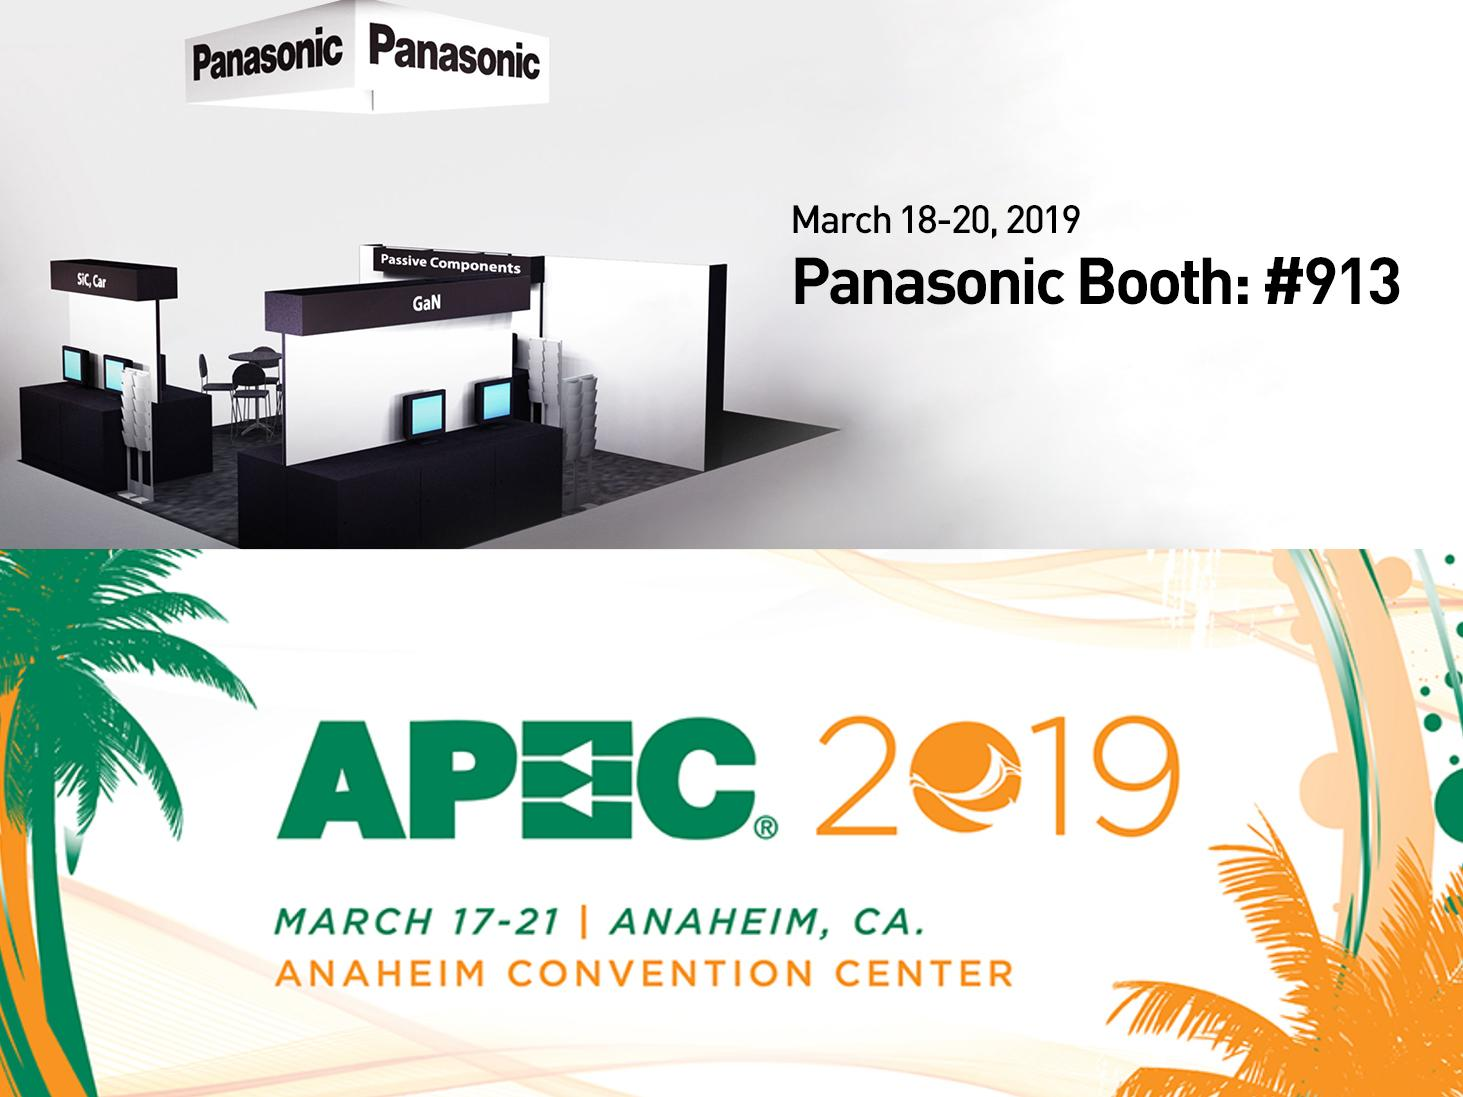 image: Panasonic booth image at APEC 2019